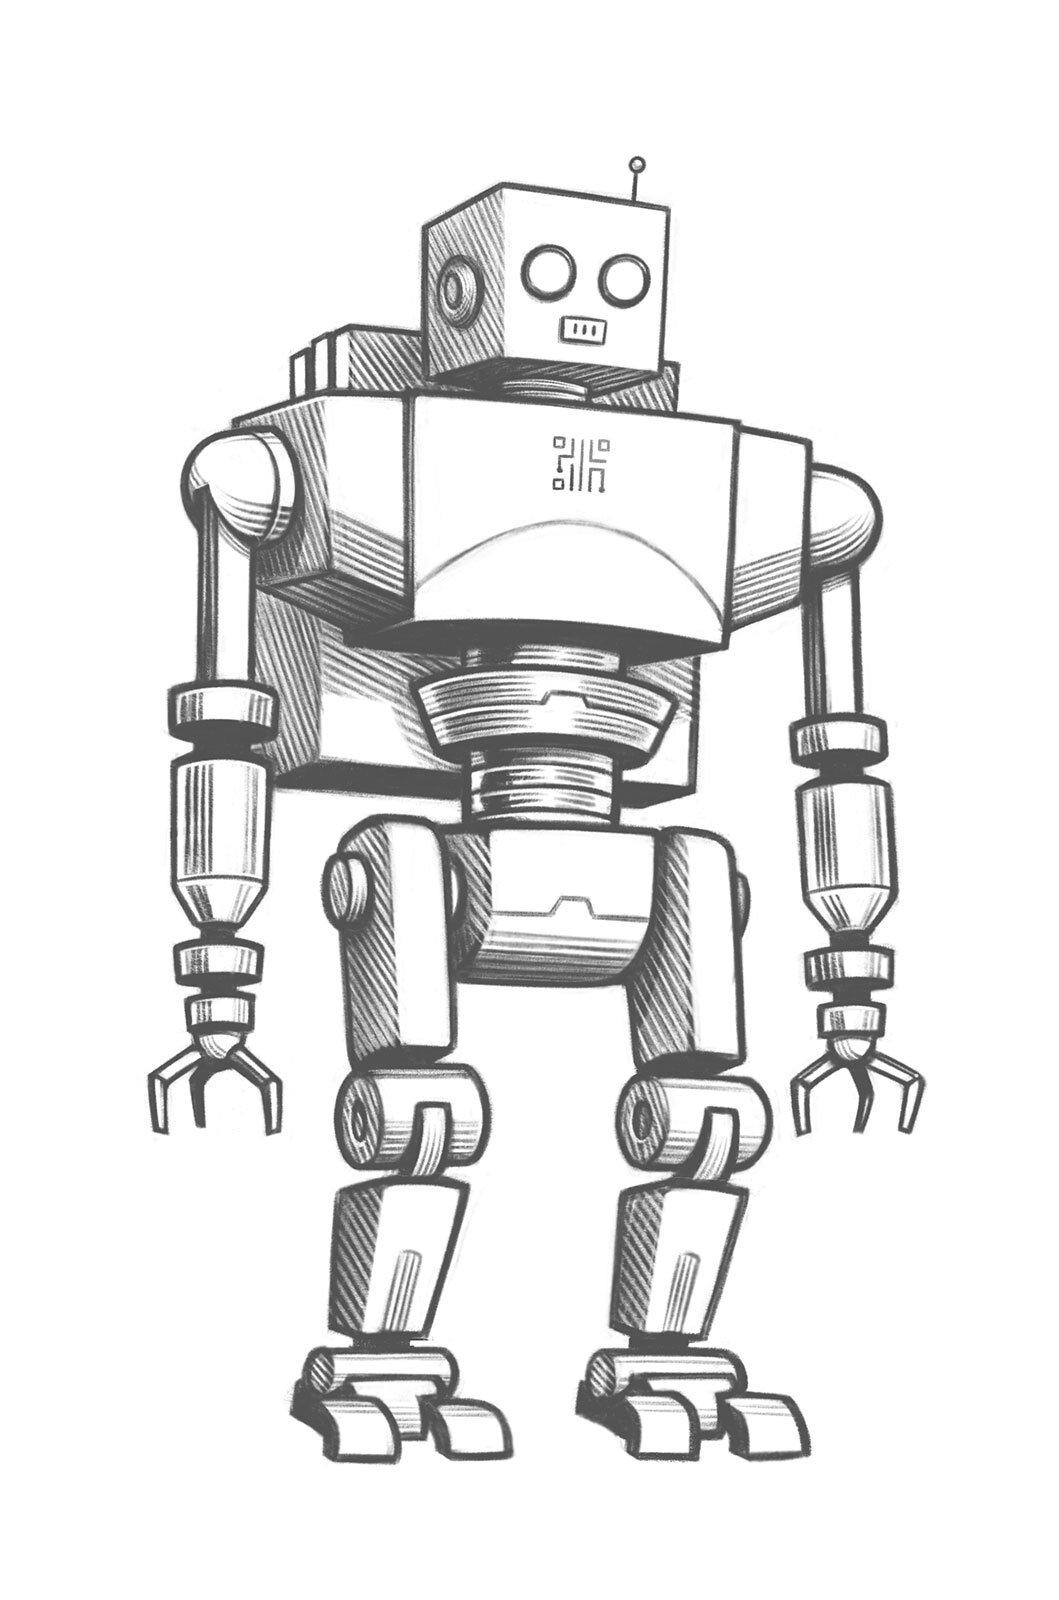 Ceeron_902 character drawing